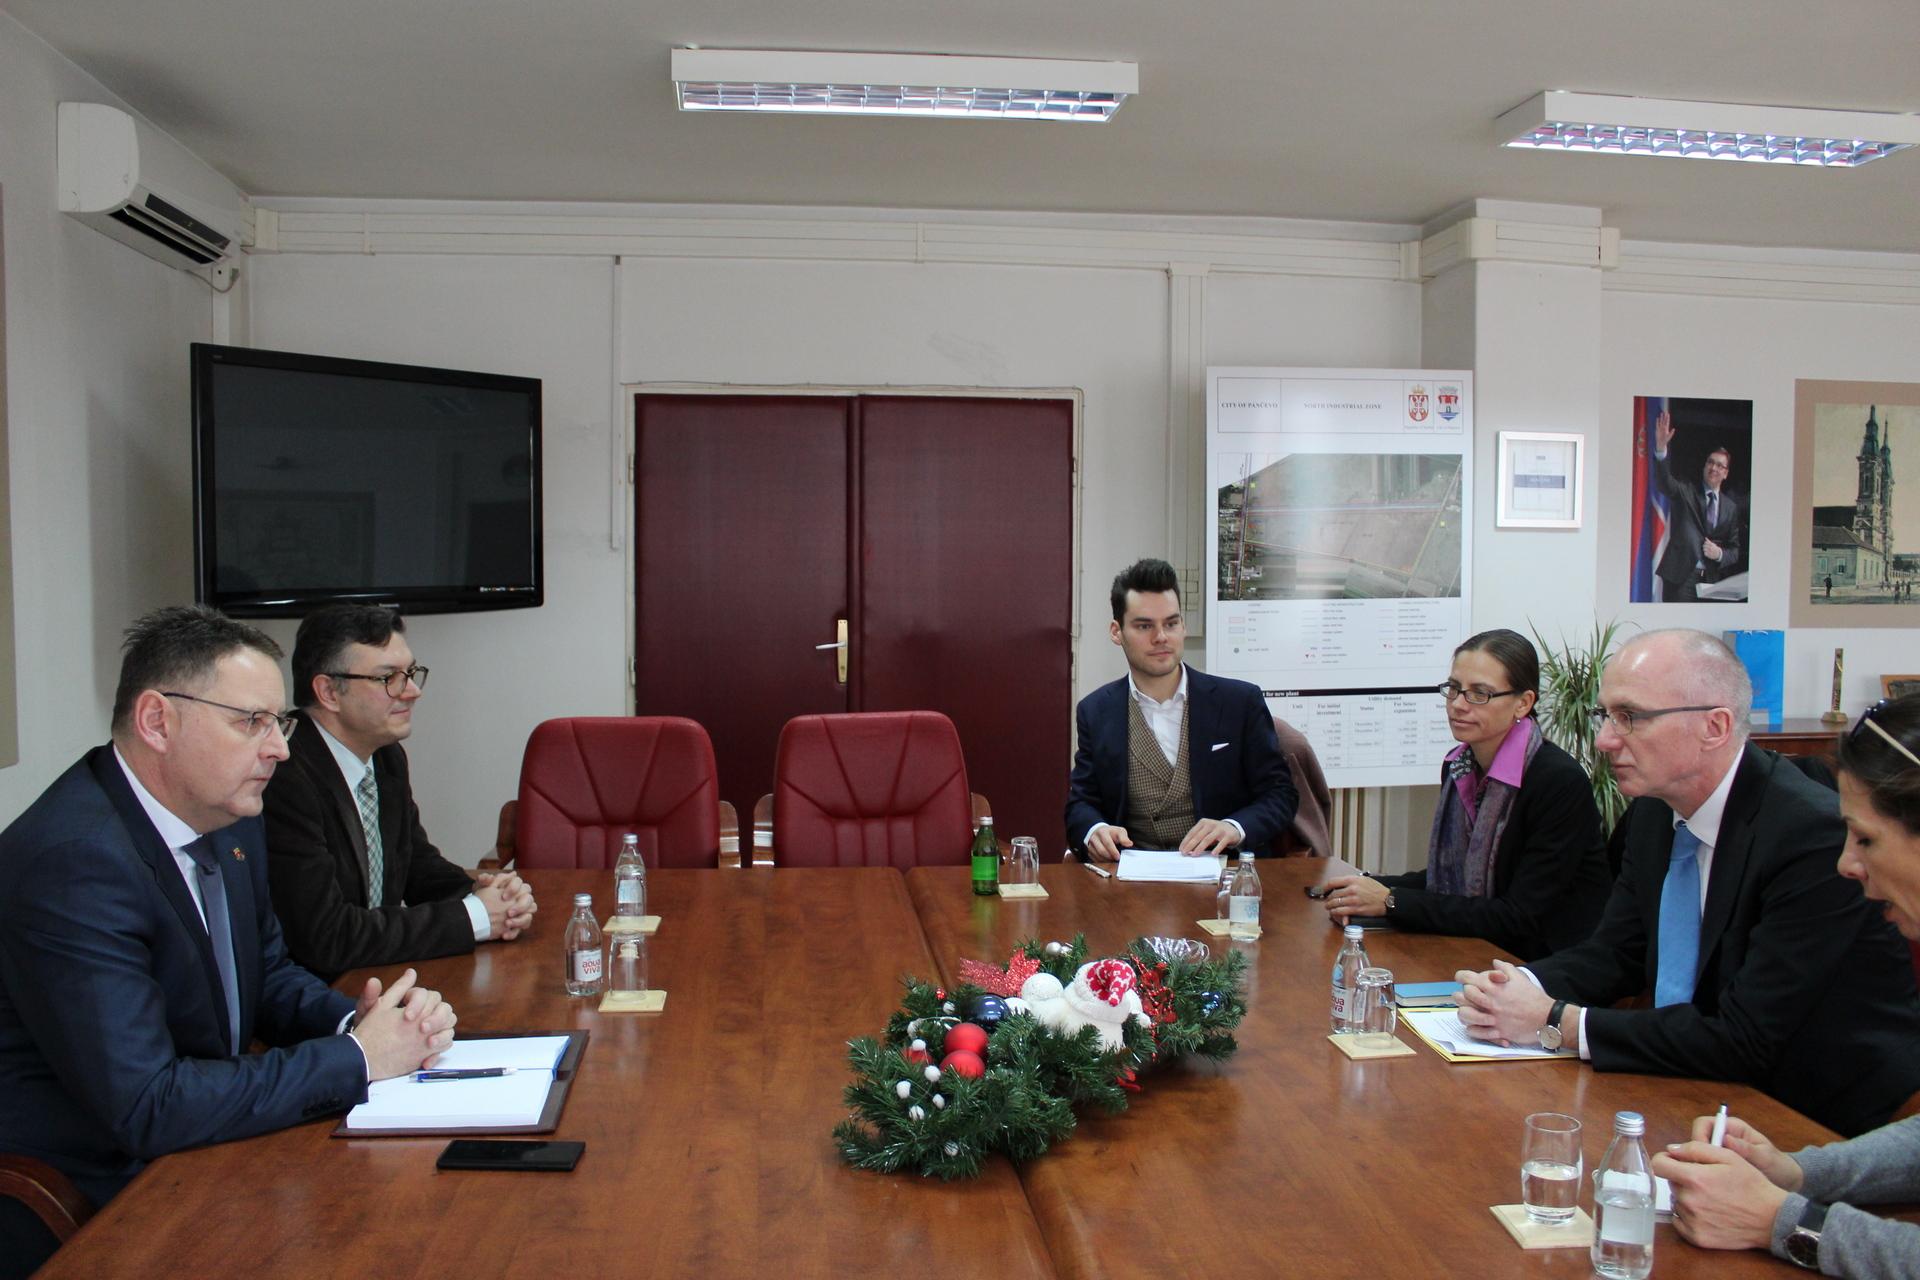 Nemački ambasador Tomas Šib u poseti Pančevu